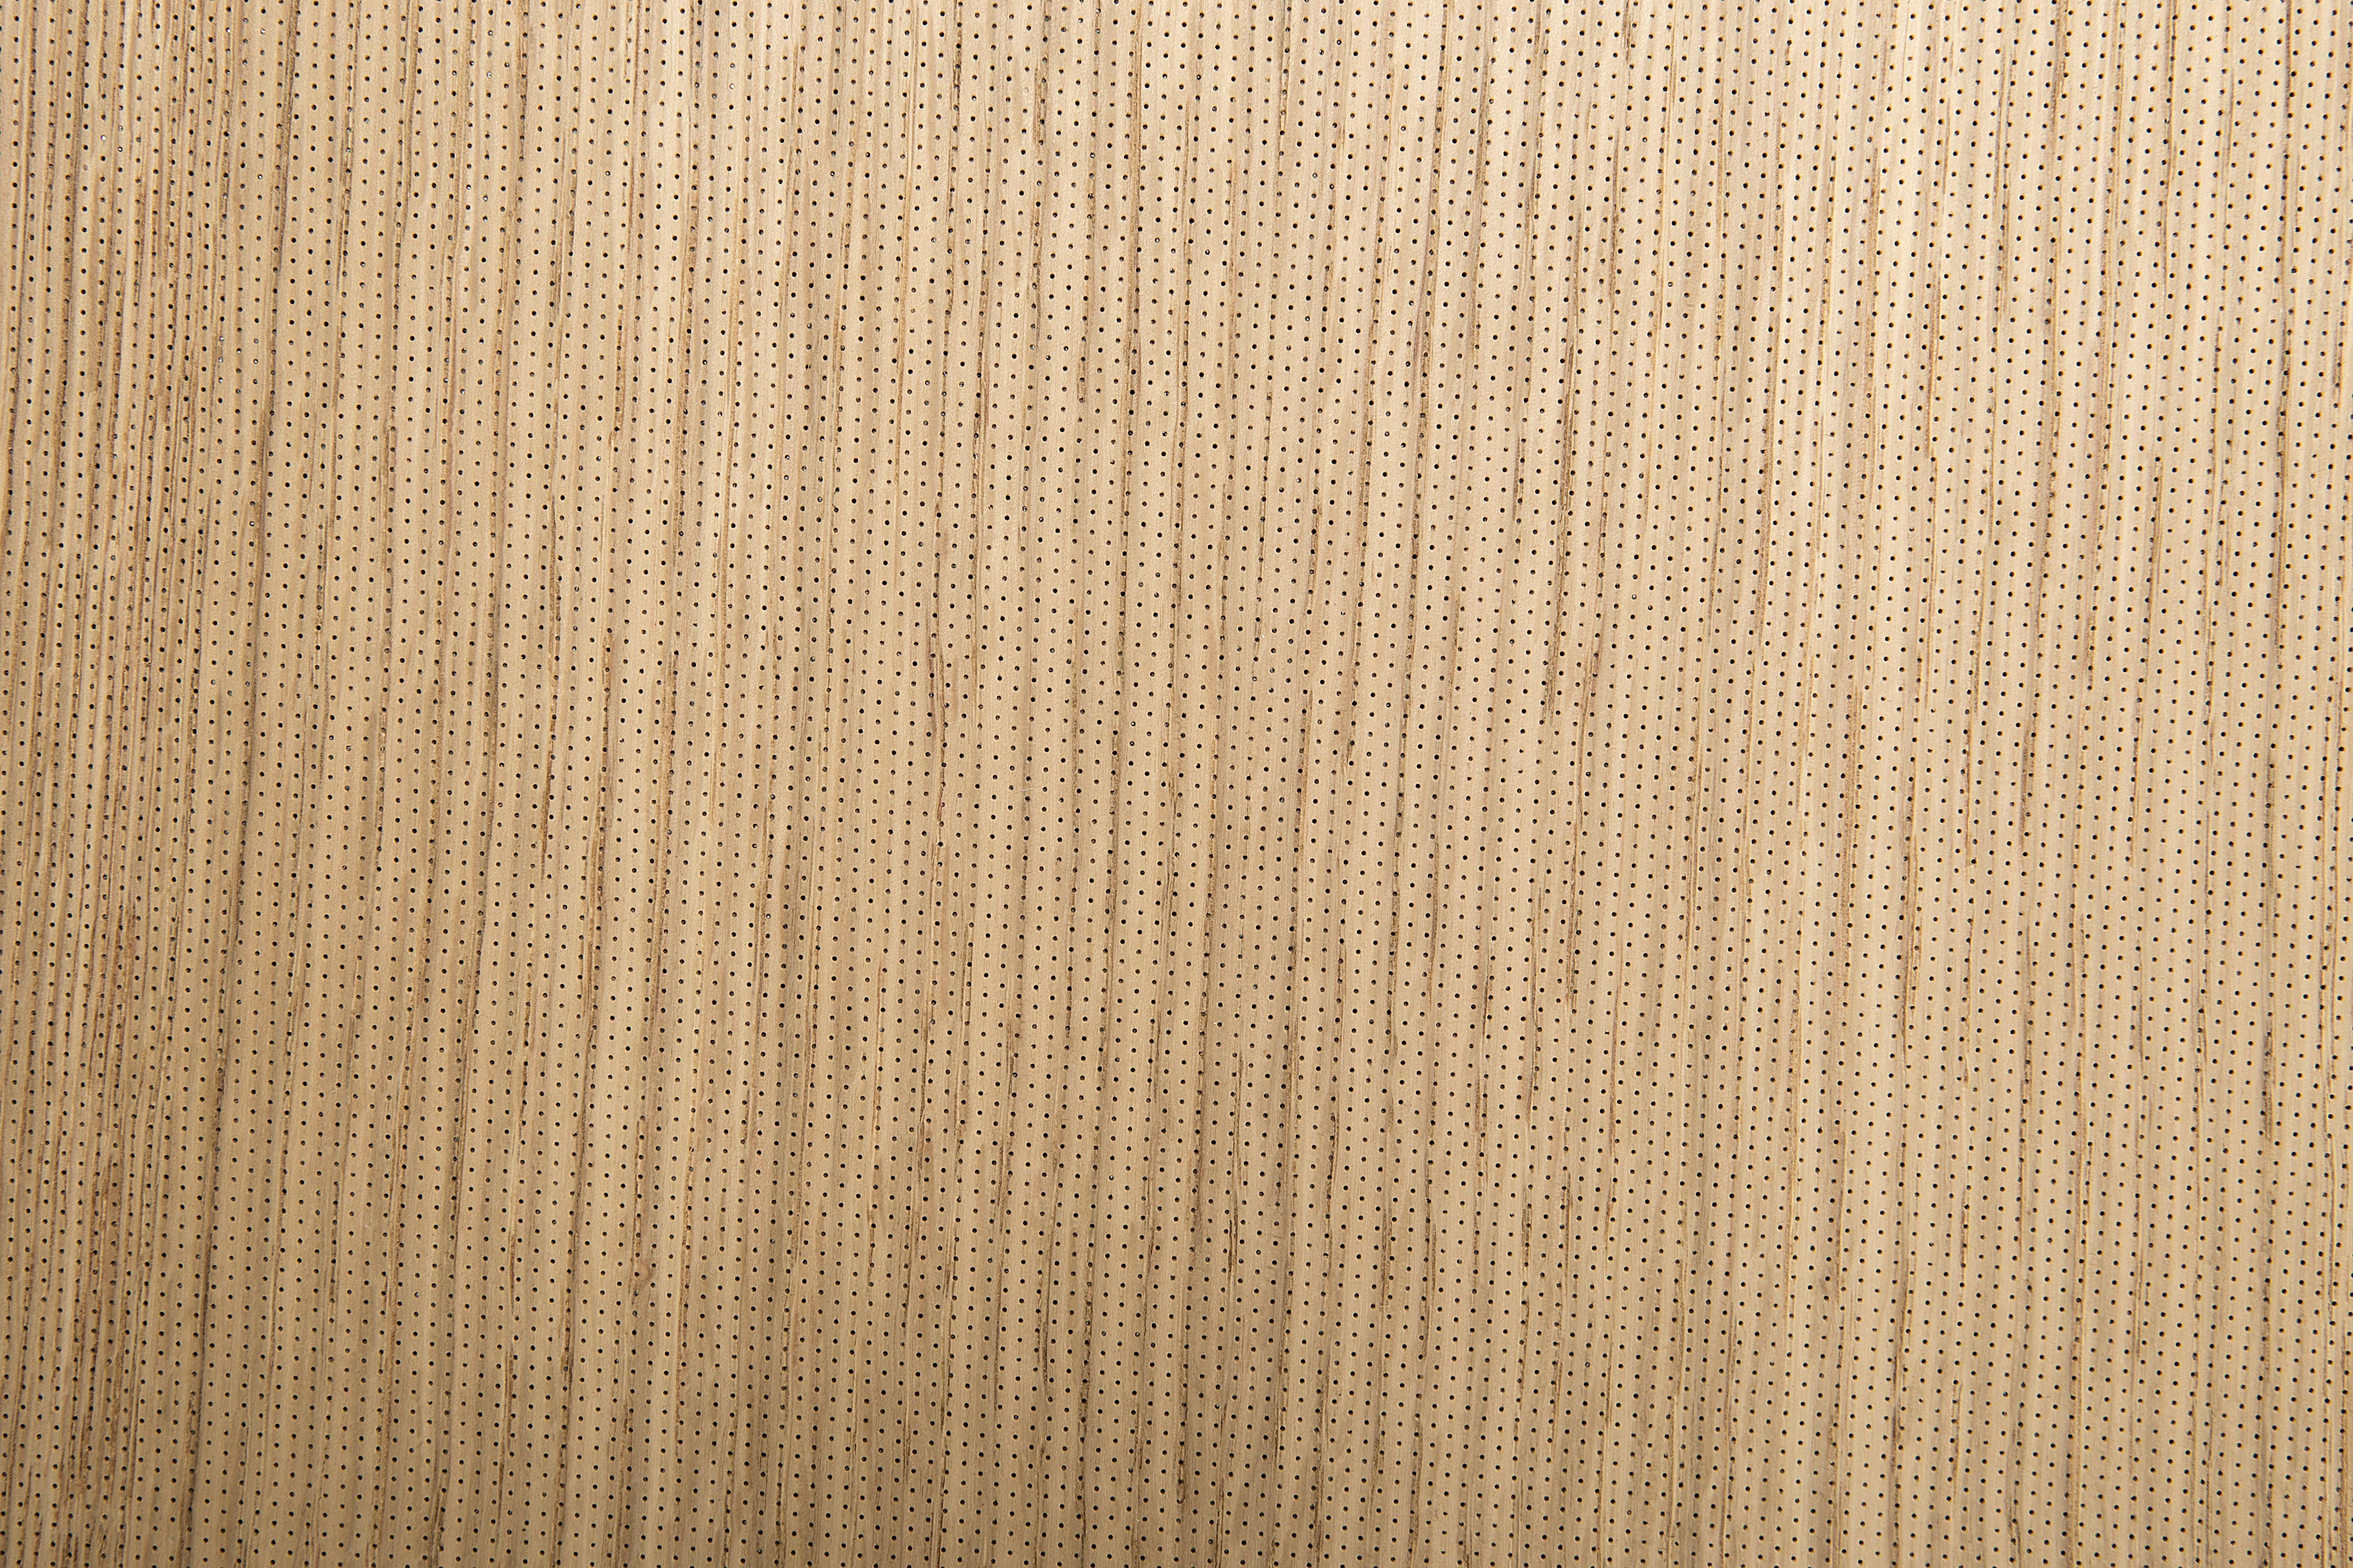 Lawapan Veneered Wood Wall Panels | Wood walls, Paint finishes and ...